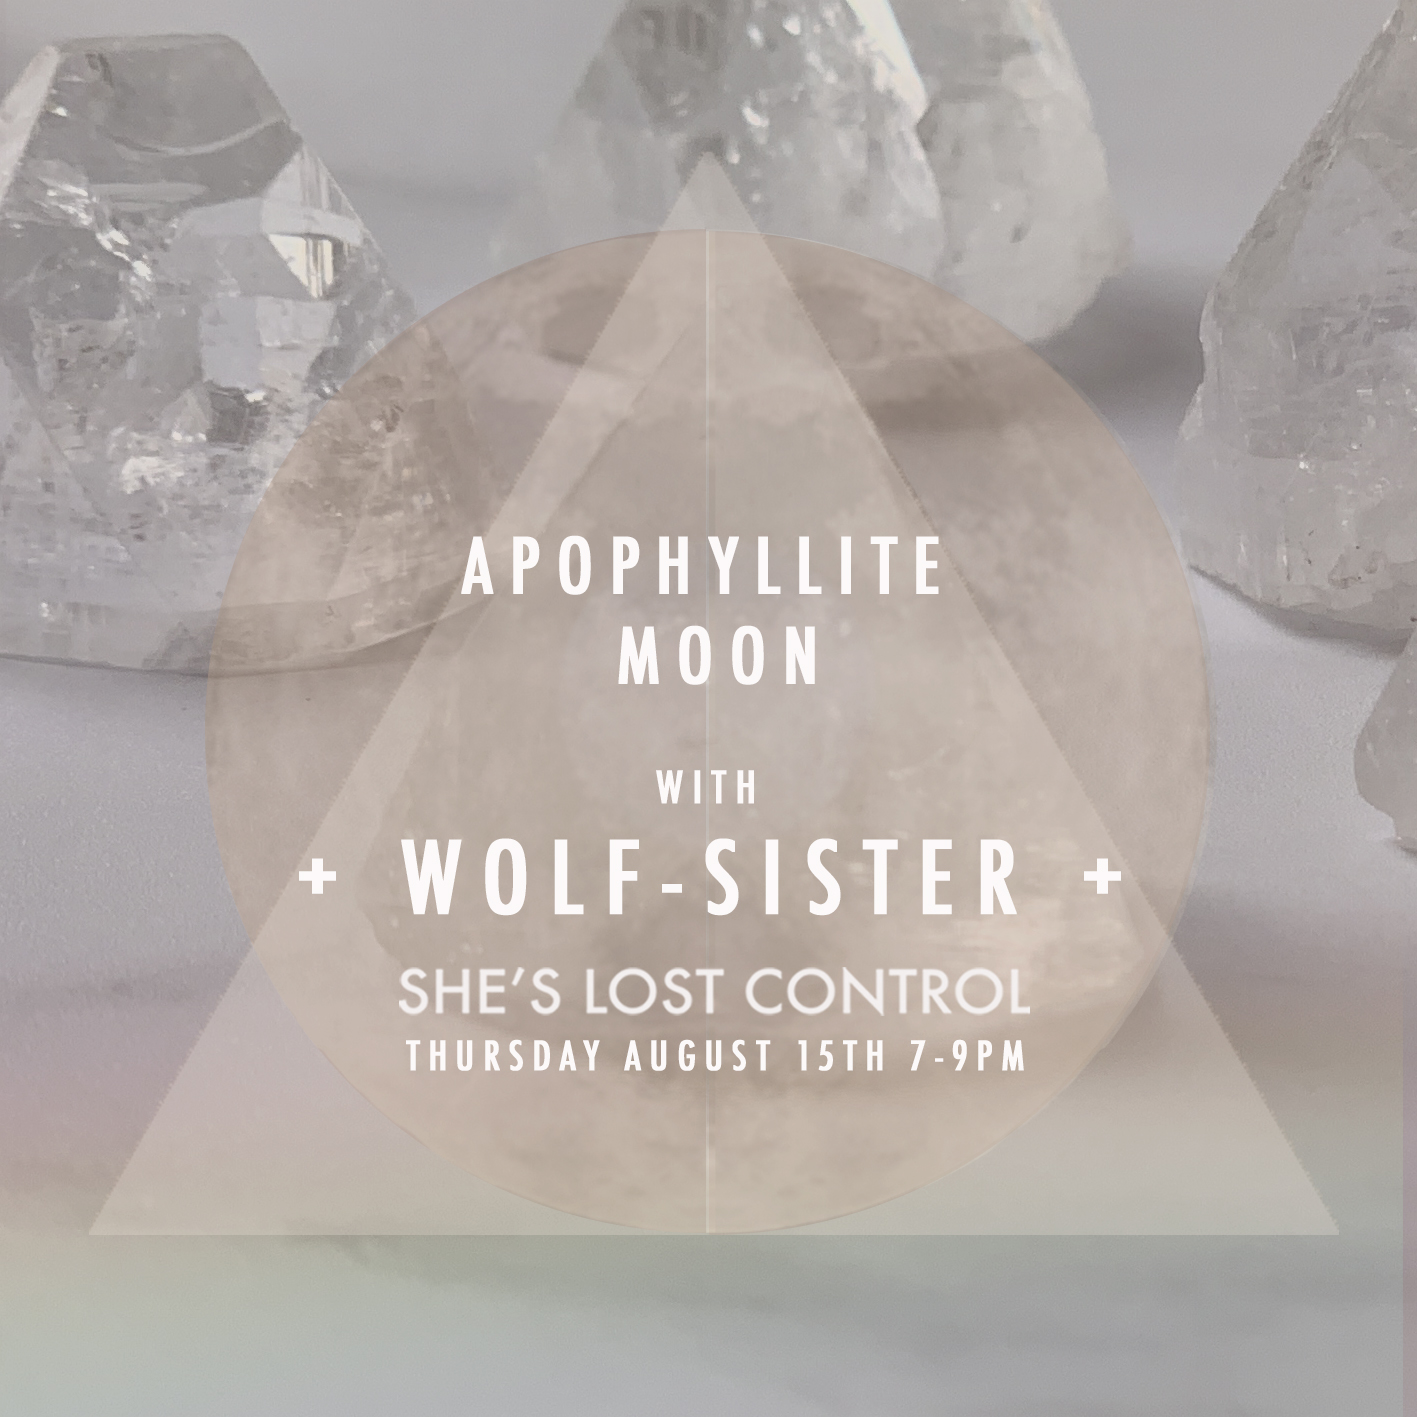 WOLF SISTER APOPHYLLITE MOON AUGUST.jpg